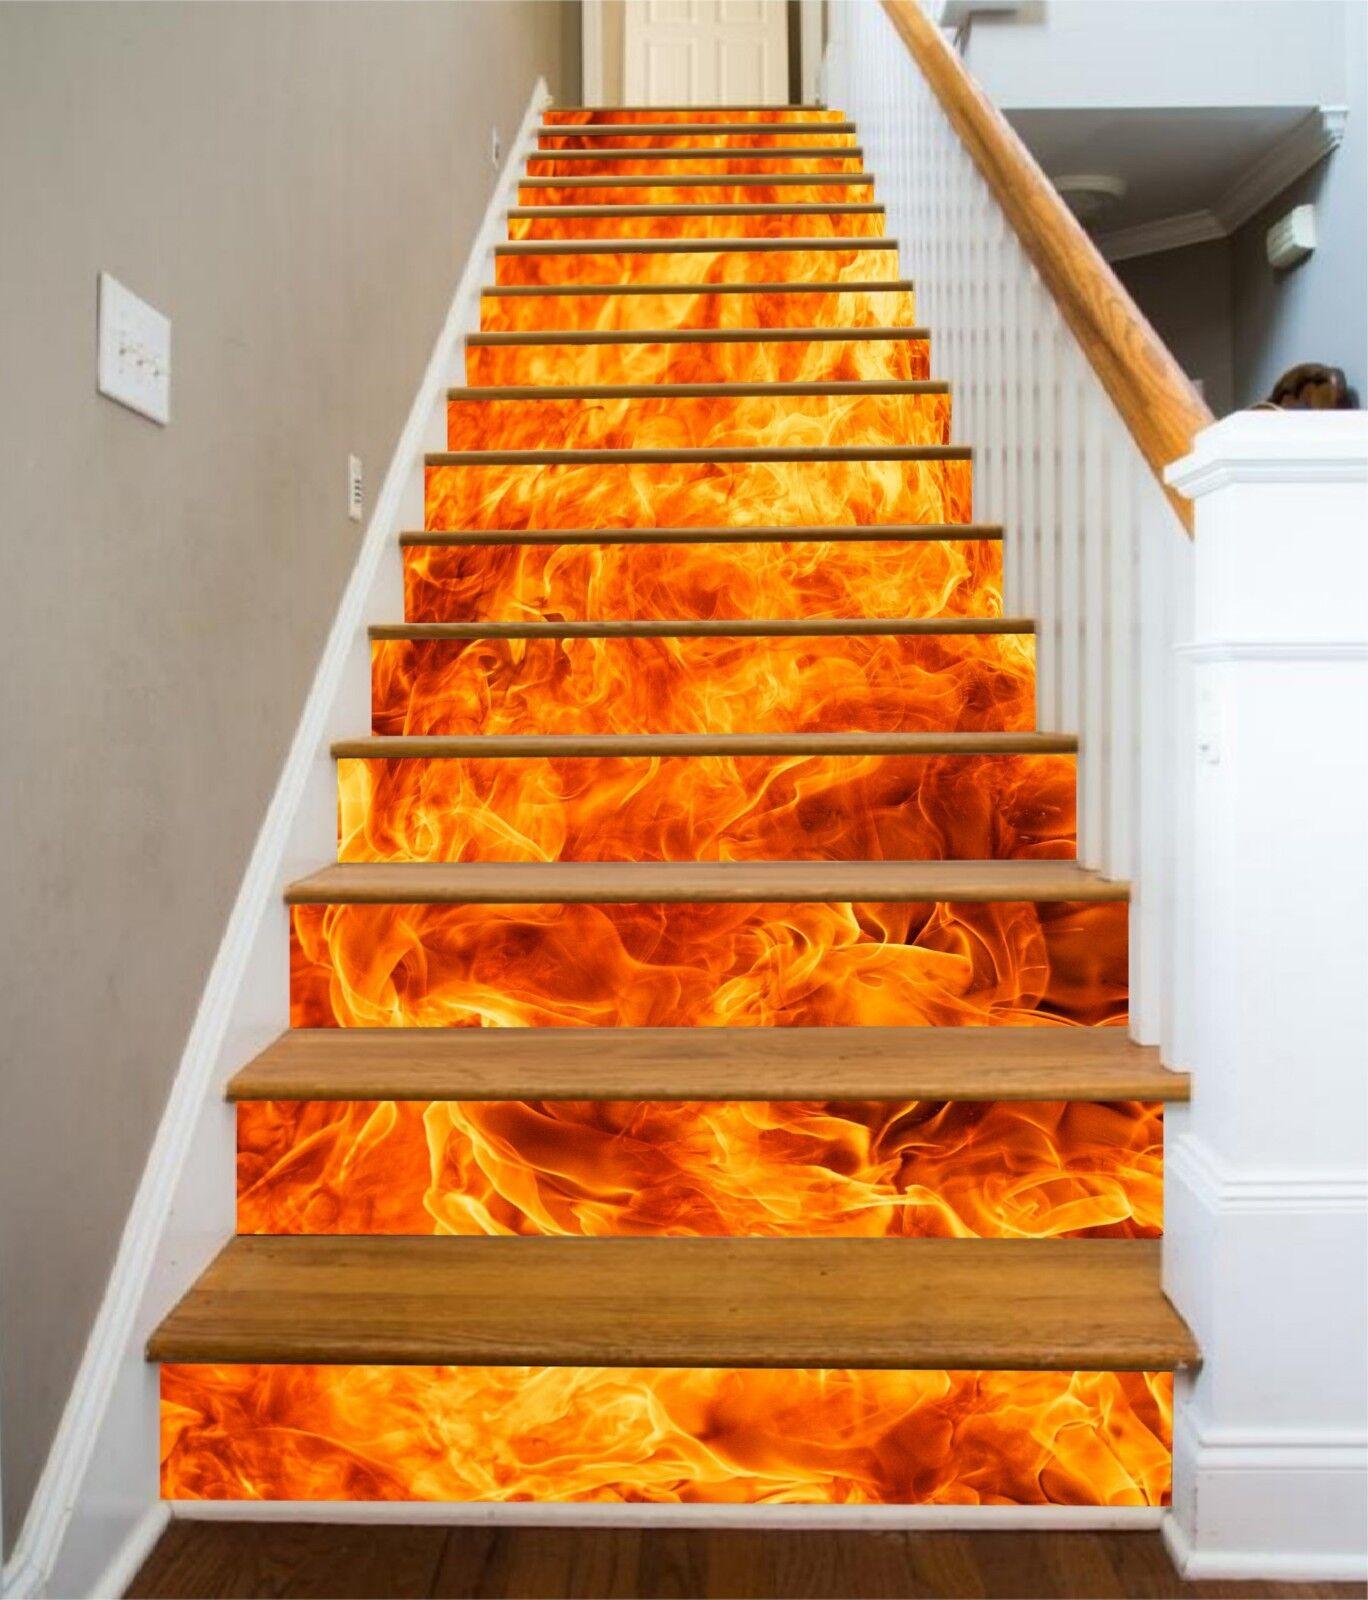 3D Flame Orange Stair Risers Decoration Photo Mural Vinyl Decal Wallpaper UK